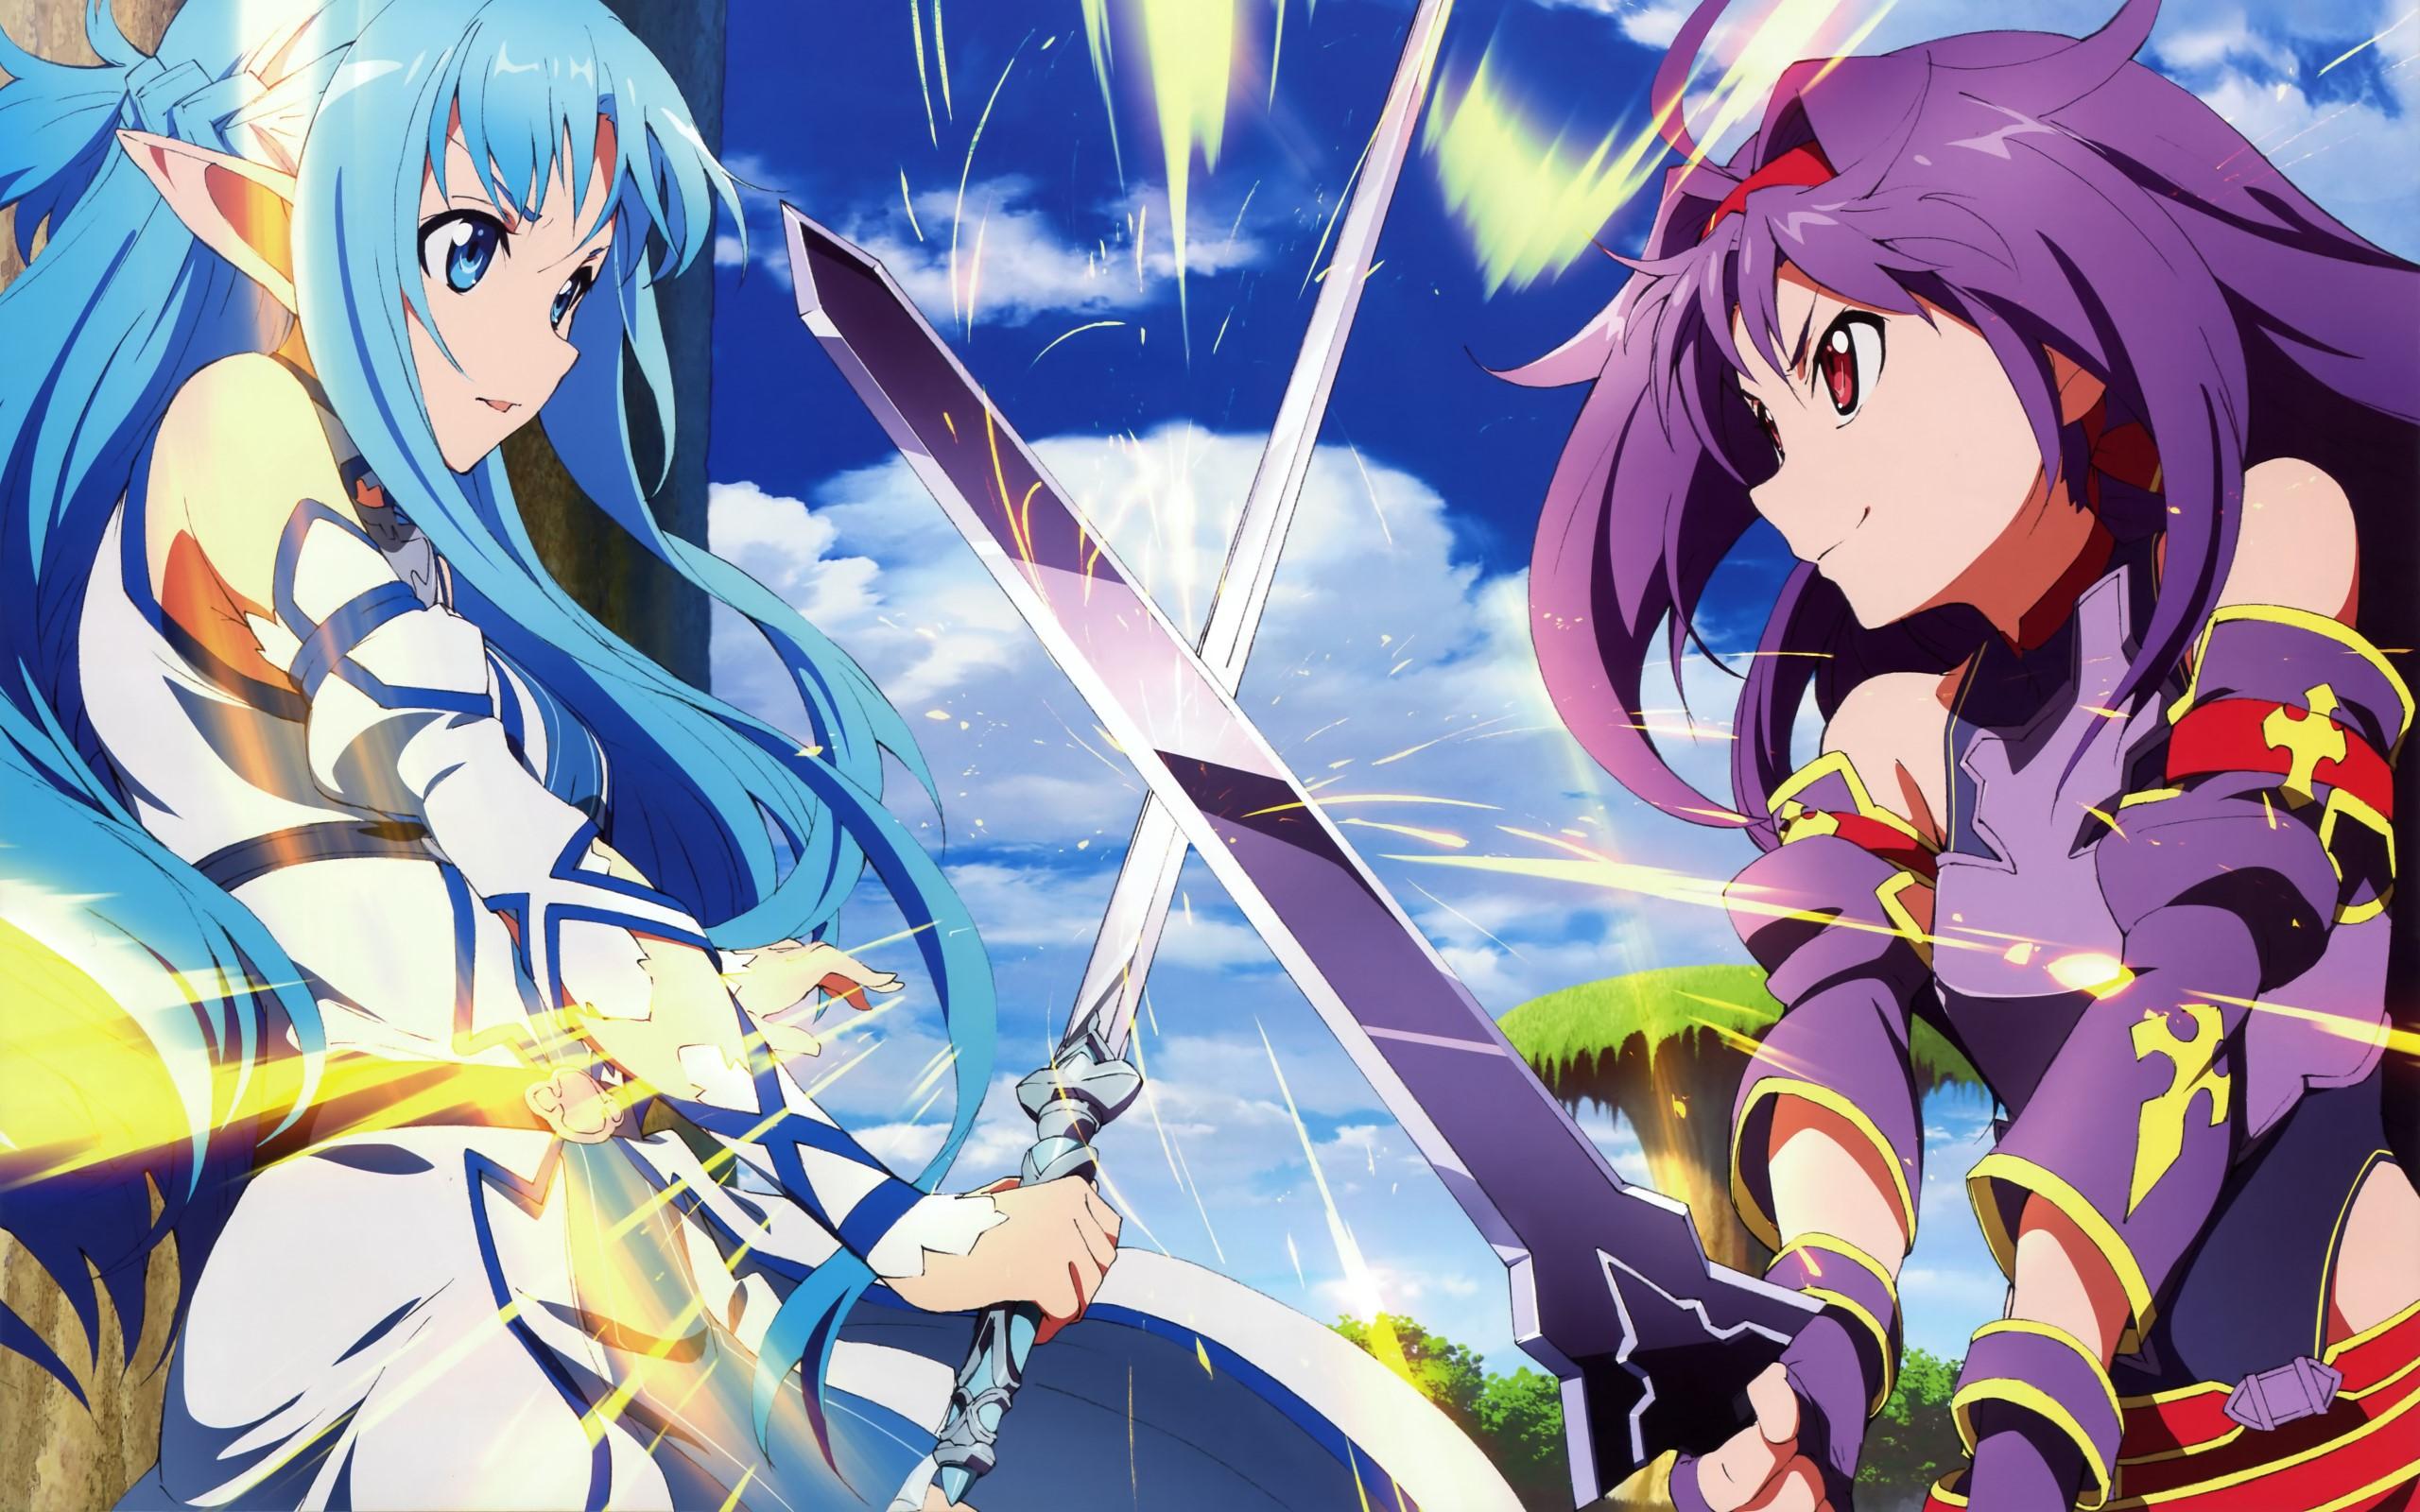 Sword Art Online Wallpaper Hd   Sword Art Online Asuna And Yuuki 2560x1600